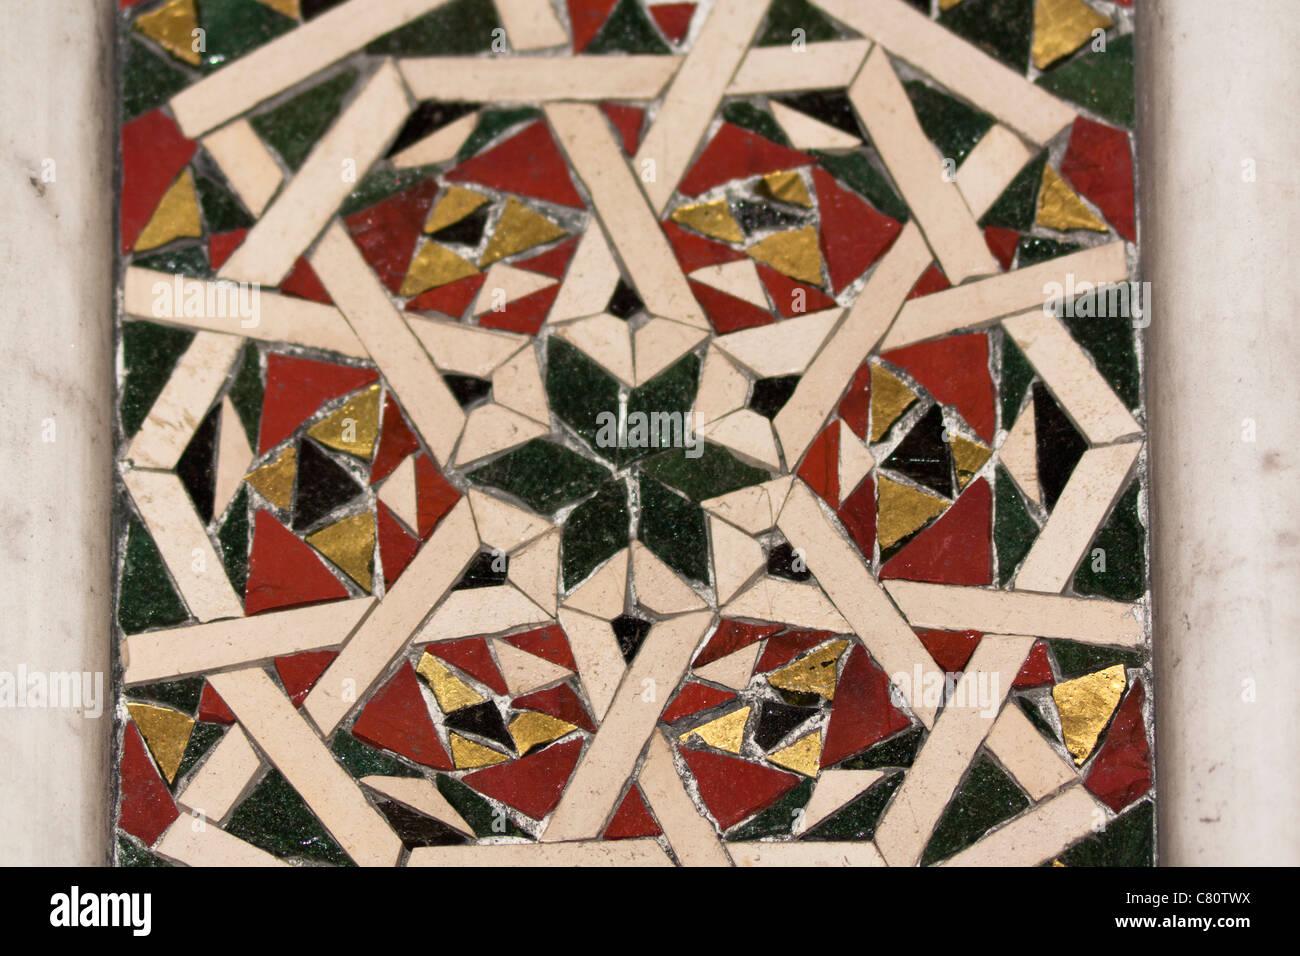 Inlaid mosaic inside Monreale Cathedral, Monreale, near Palermo, Sicily, Italy - Stock Image